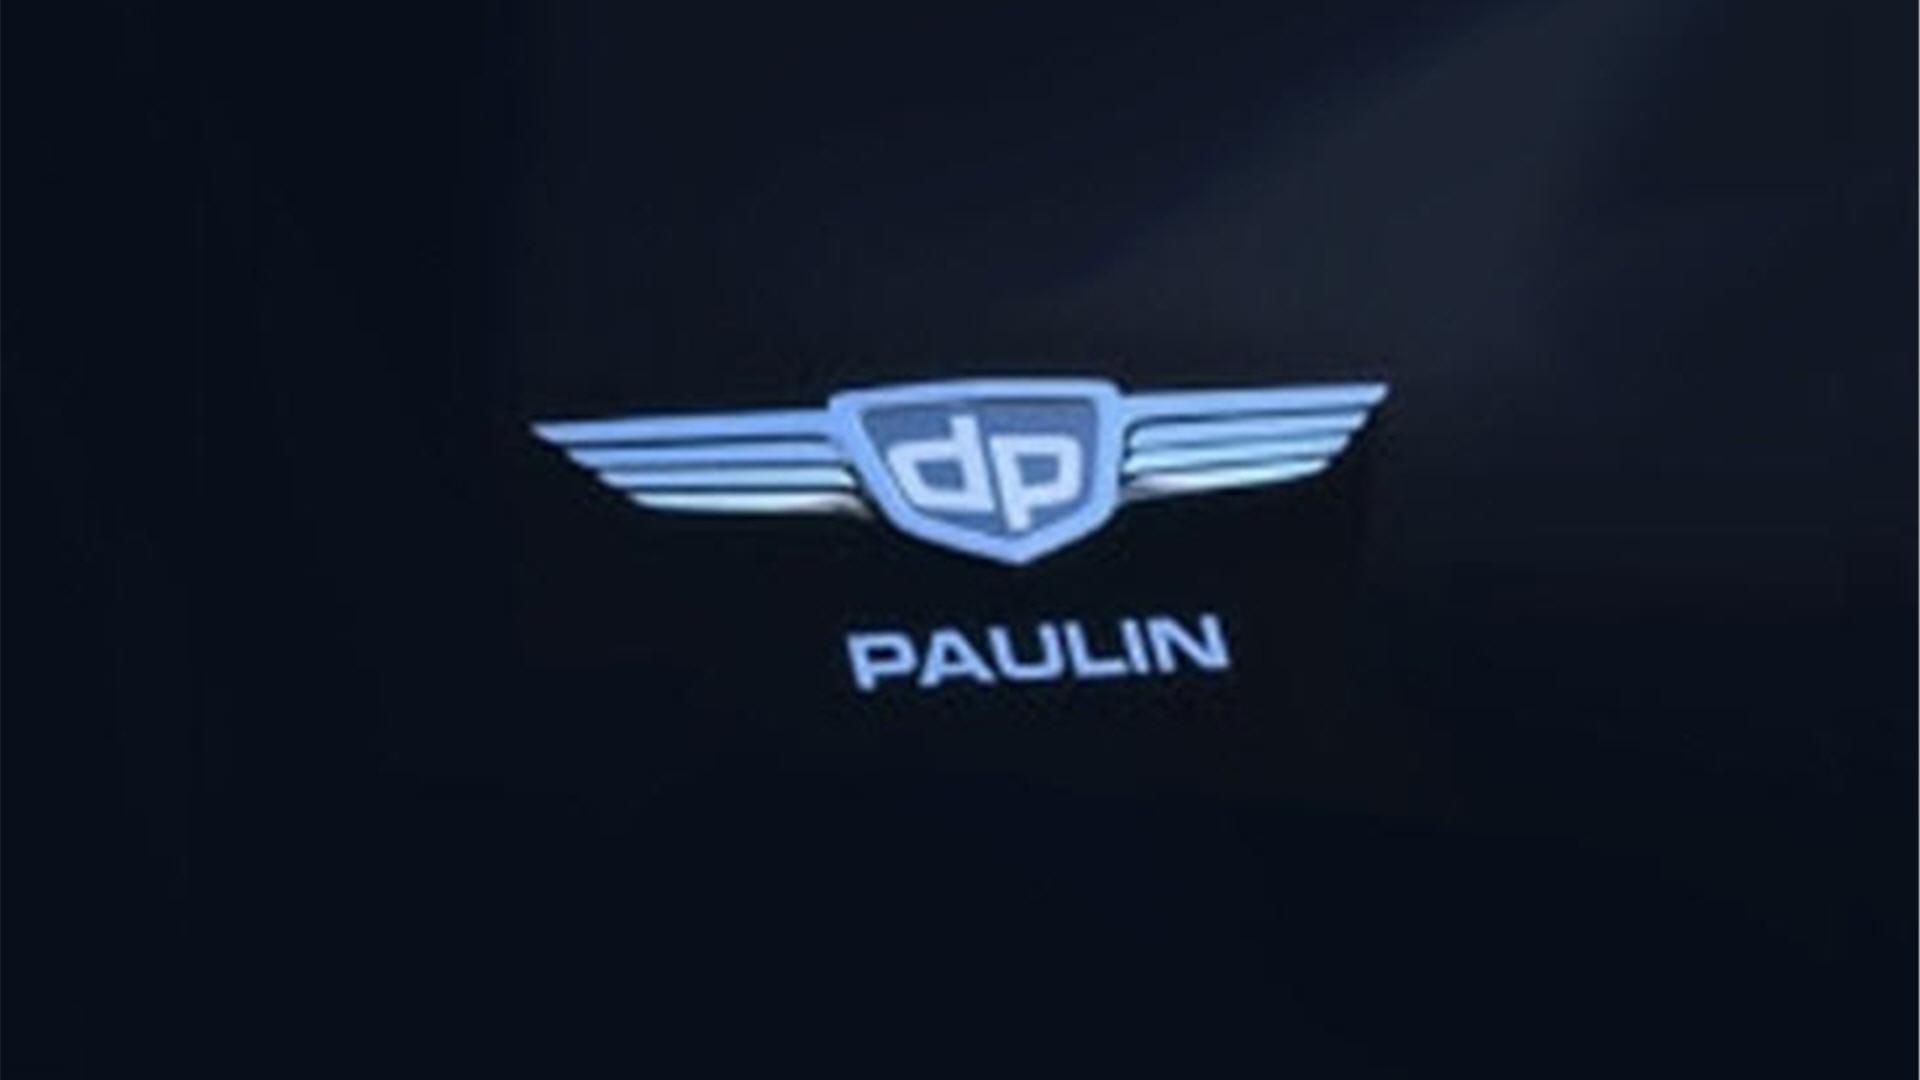 Related search Paulin Logo 1920x1080 Car logos 1920x1080